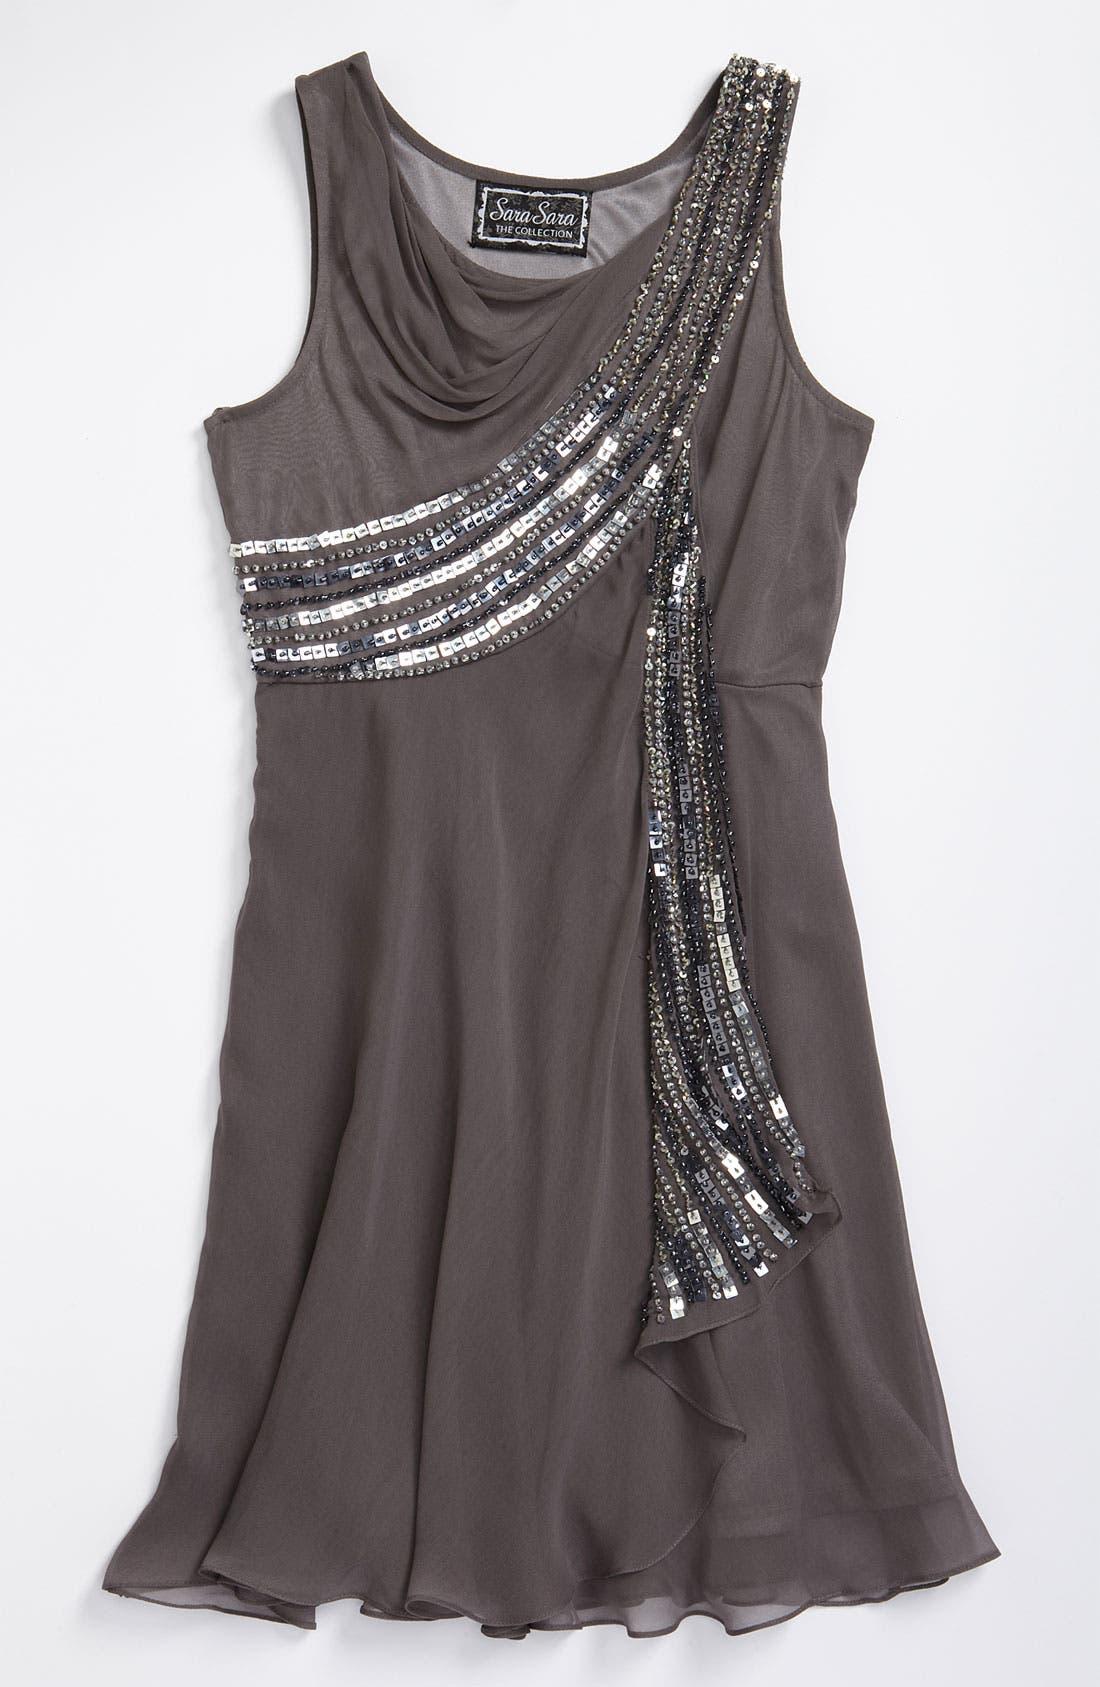 Alternate Image 1 Selected - Sara Sara Sequin Dress (Big Girls)